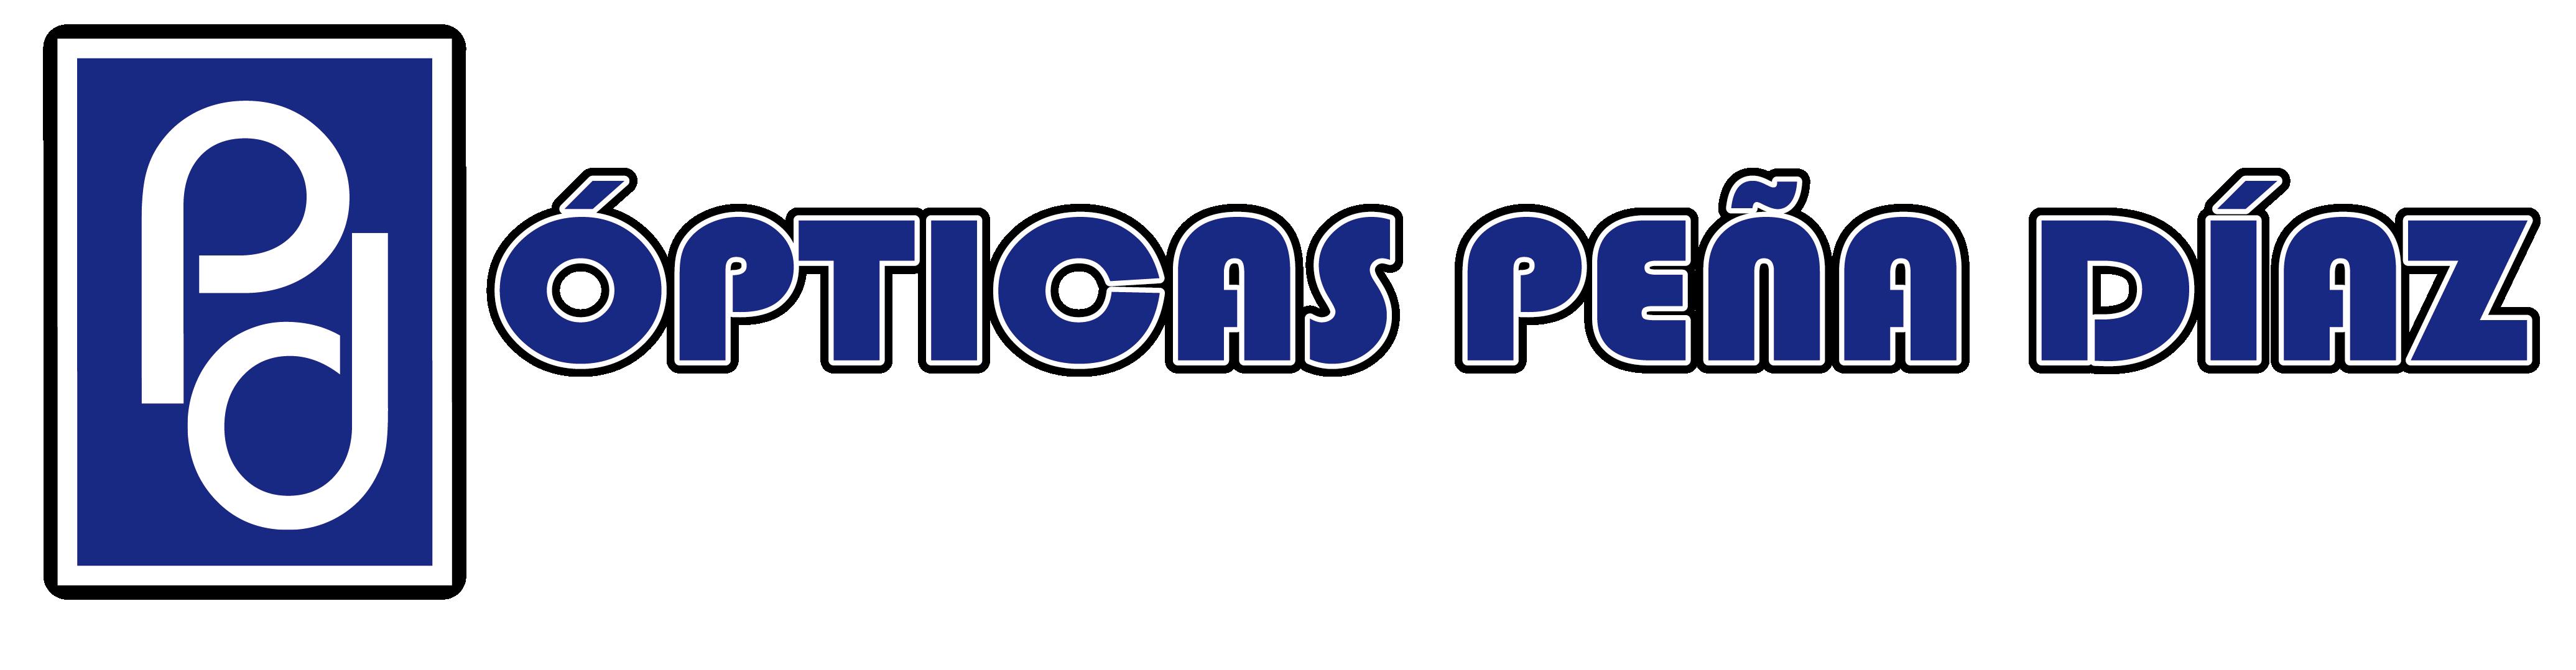 OPTICA PEÑA DIAZ logo PDF-01